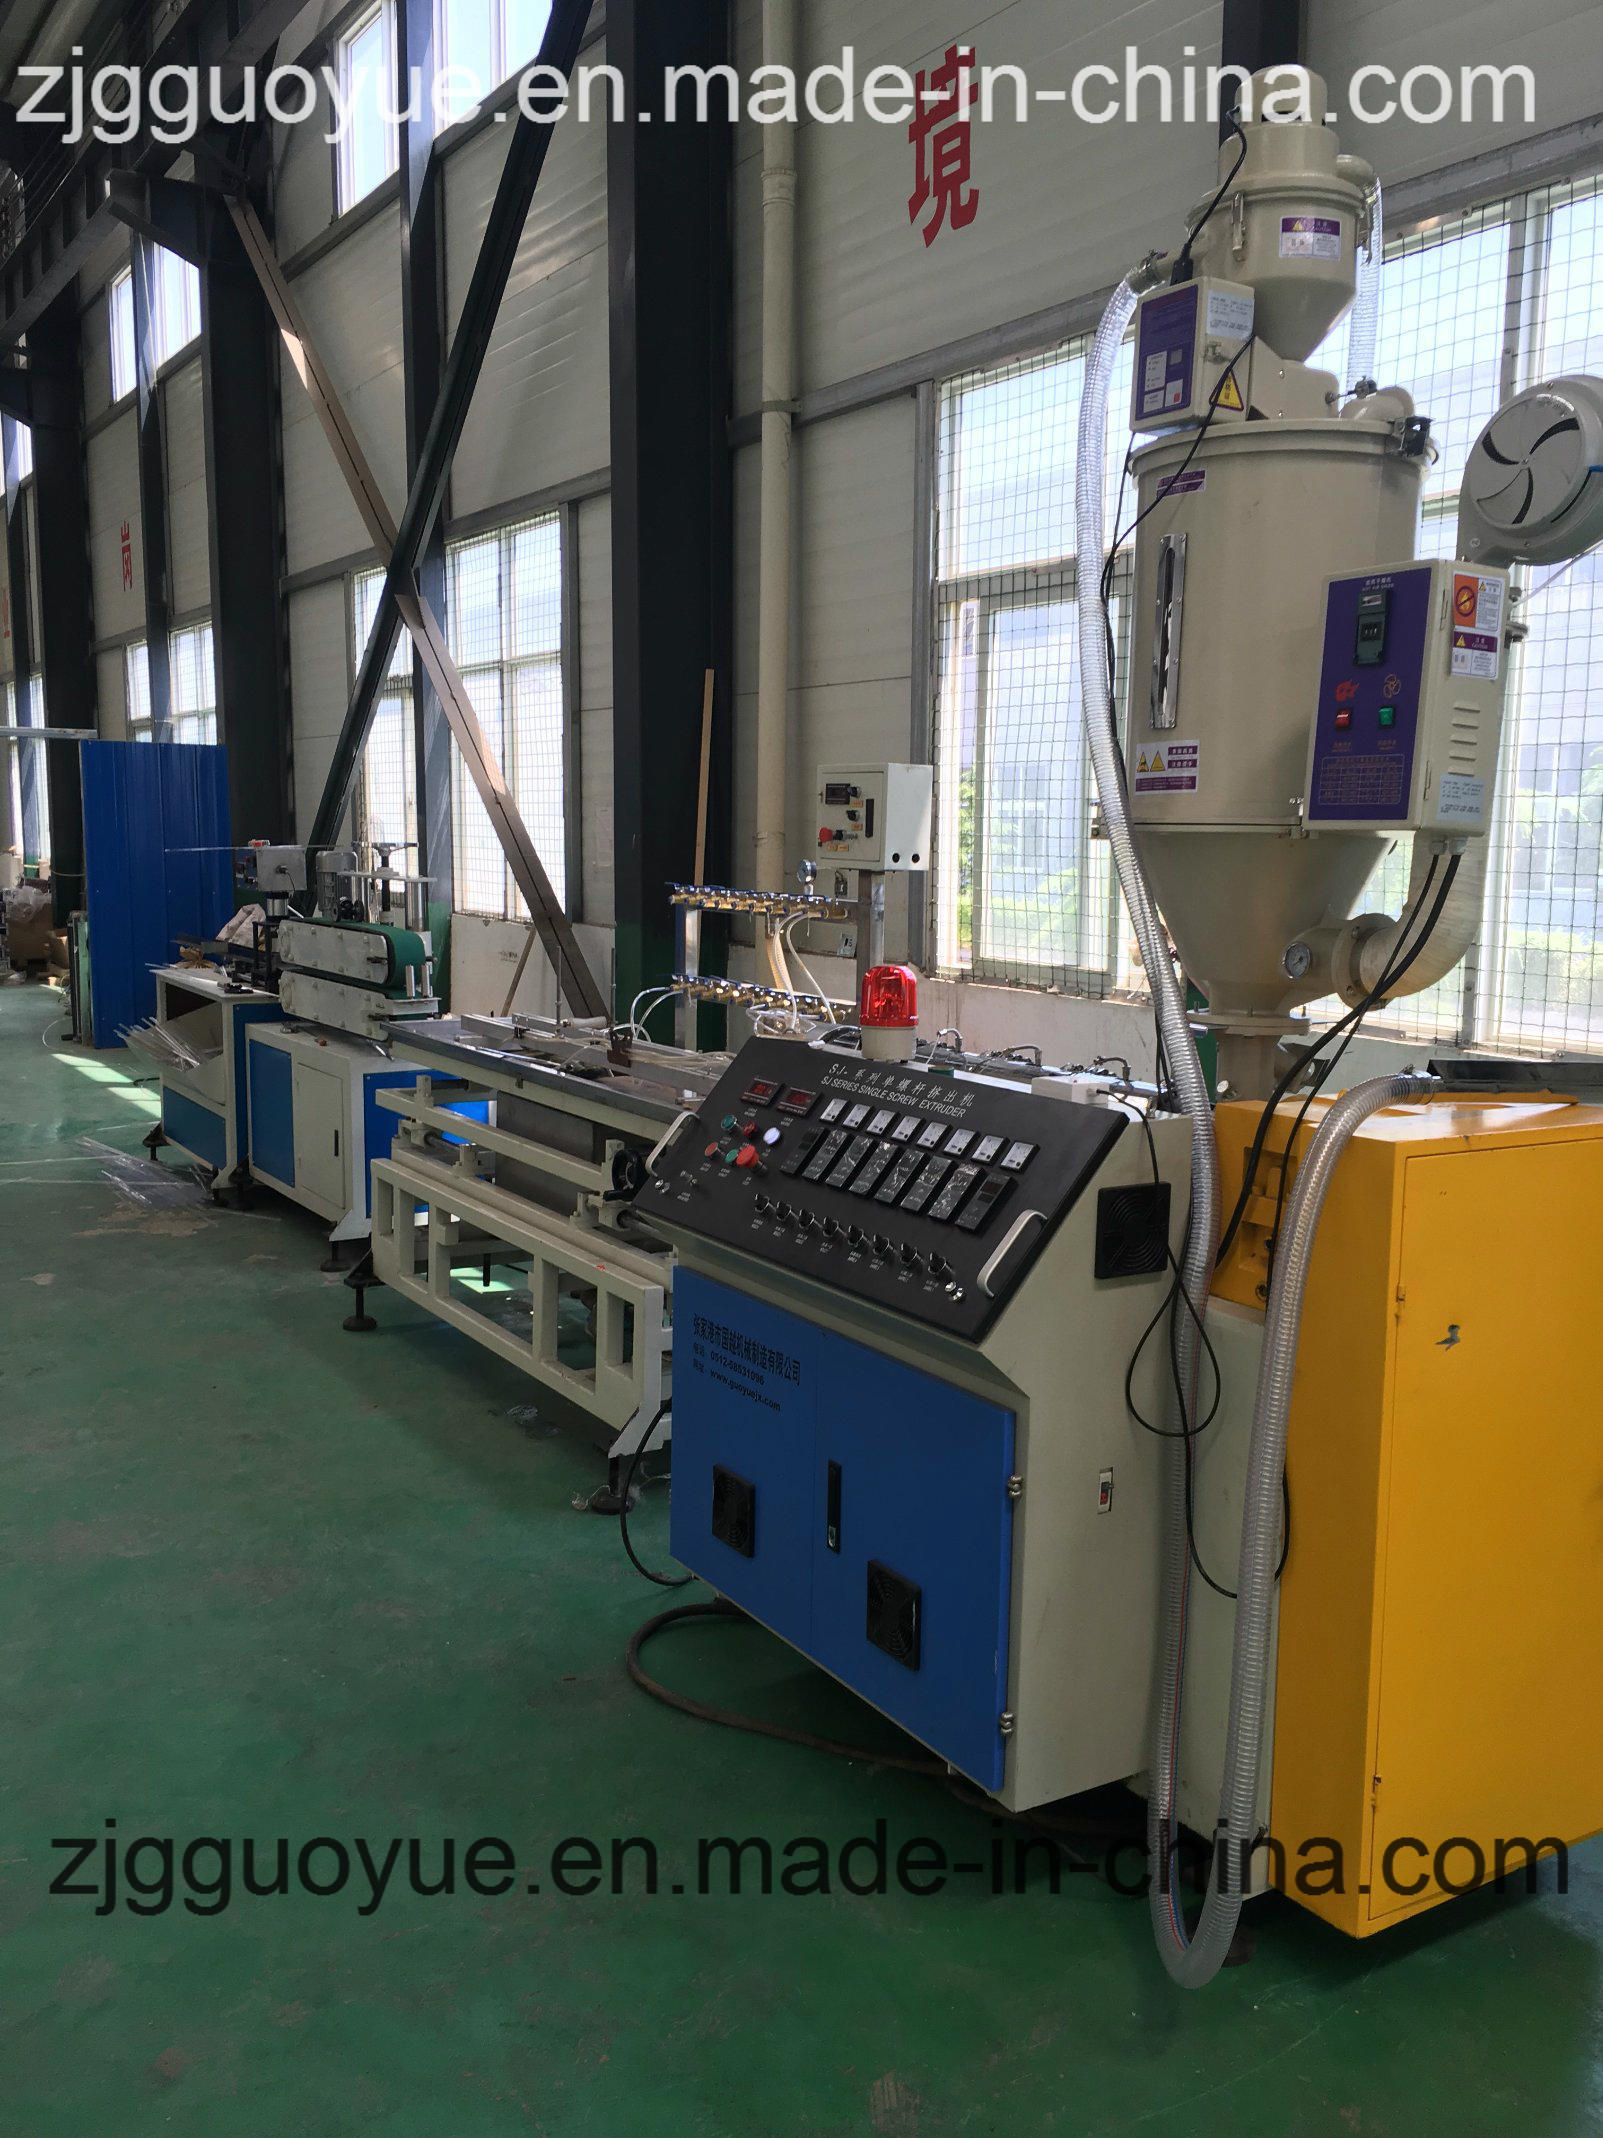 Insulation PA6 Nylon Rod Production Machine